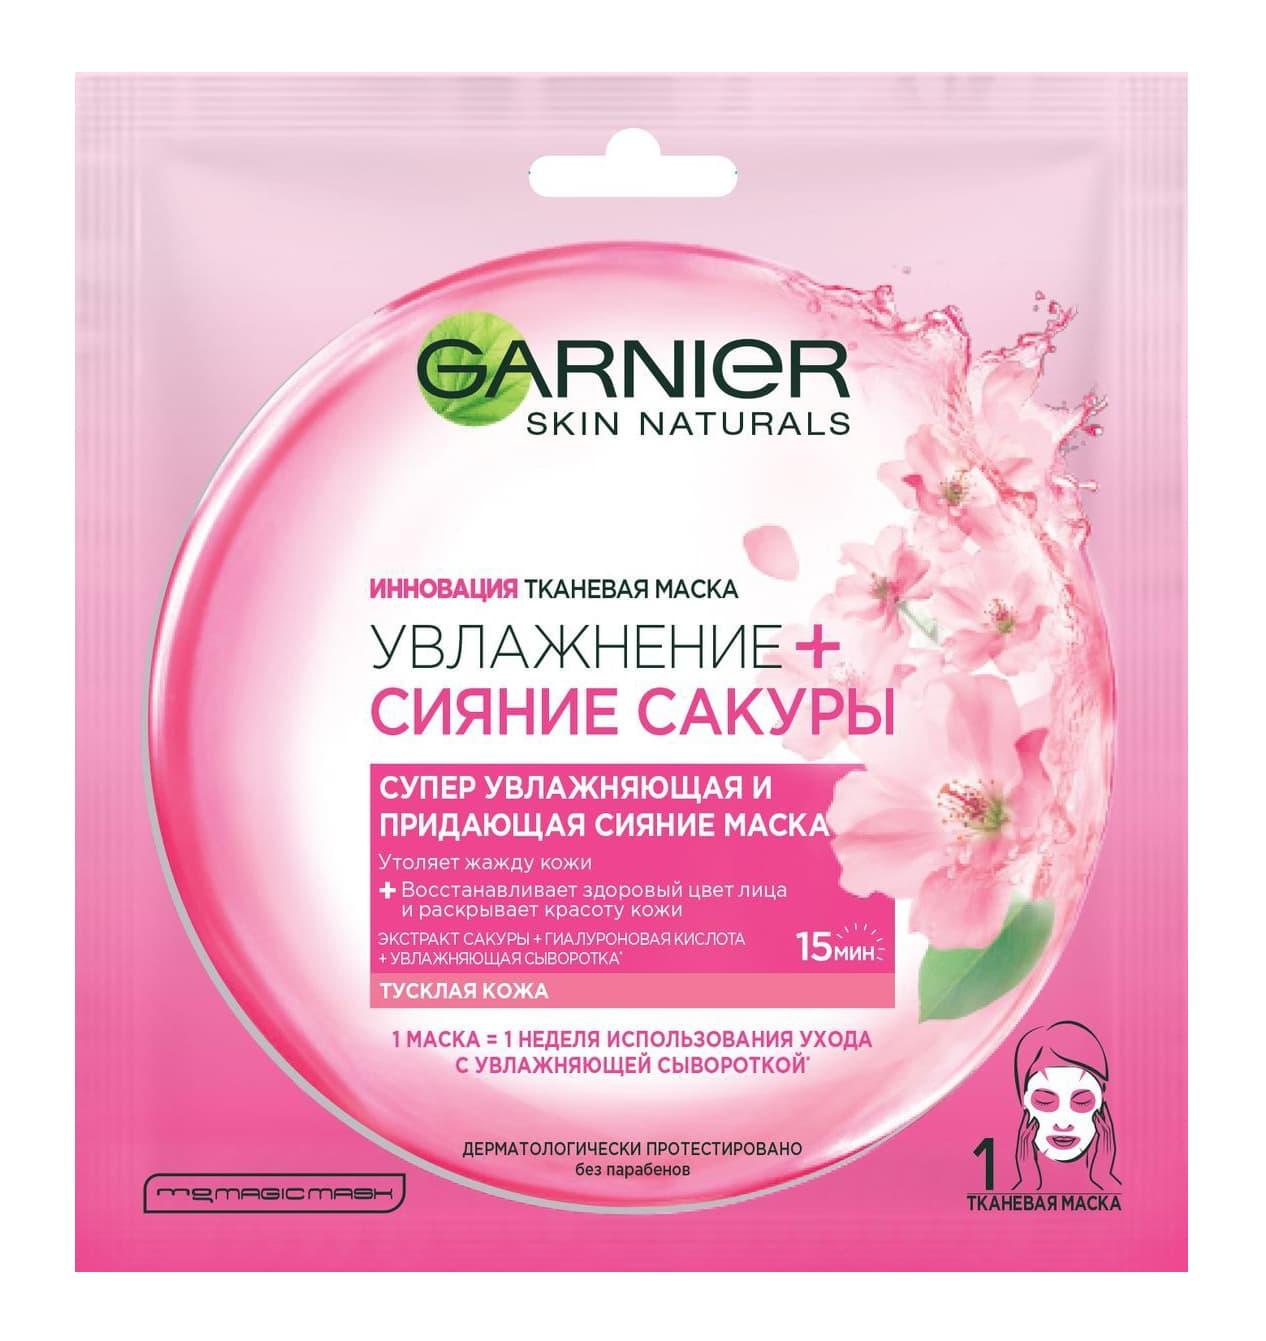 Garnier Skin Naturals Увлажнение Сияние Сакуры Тканевая Маска